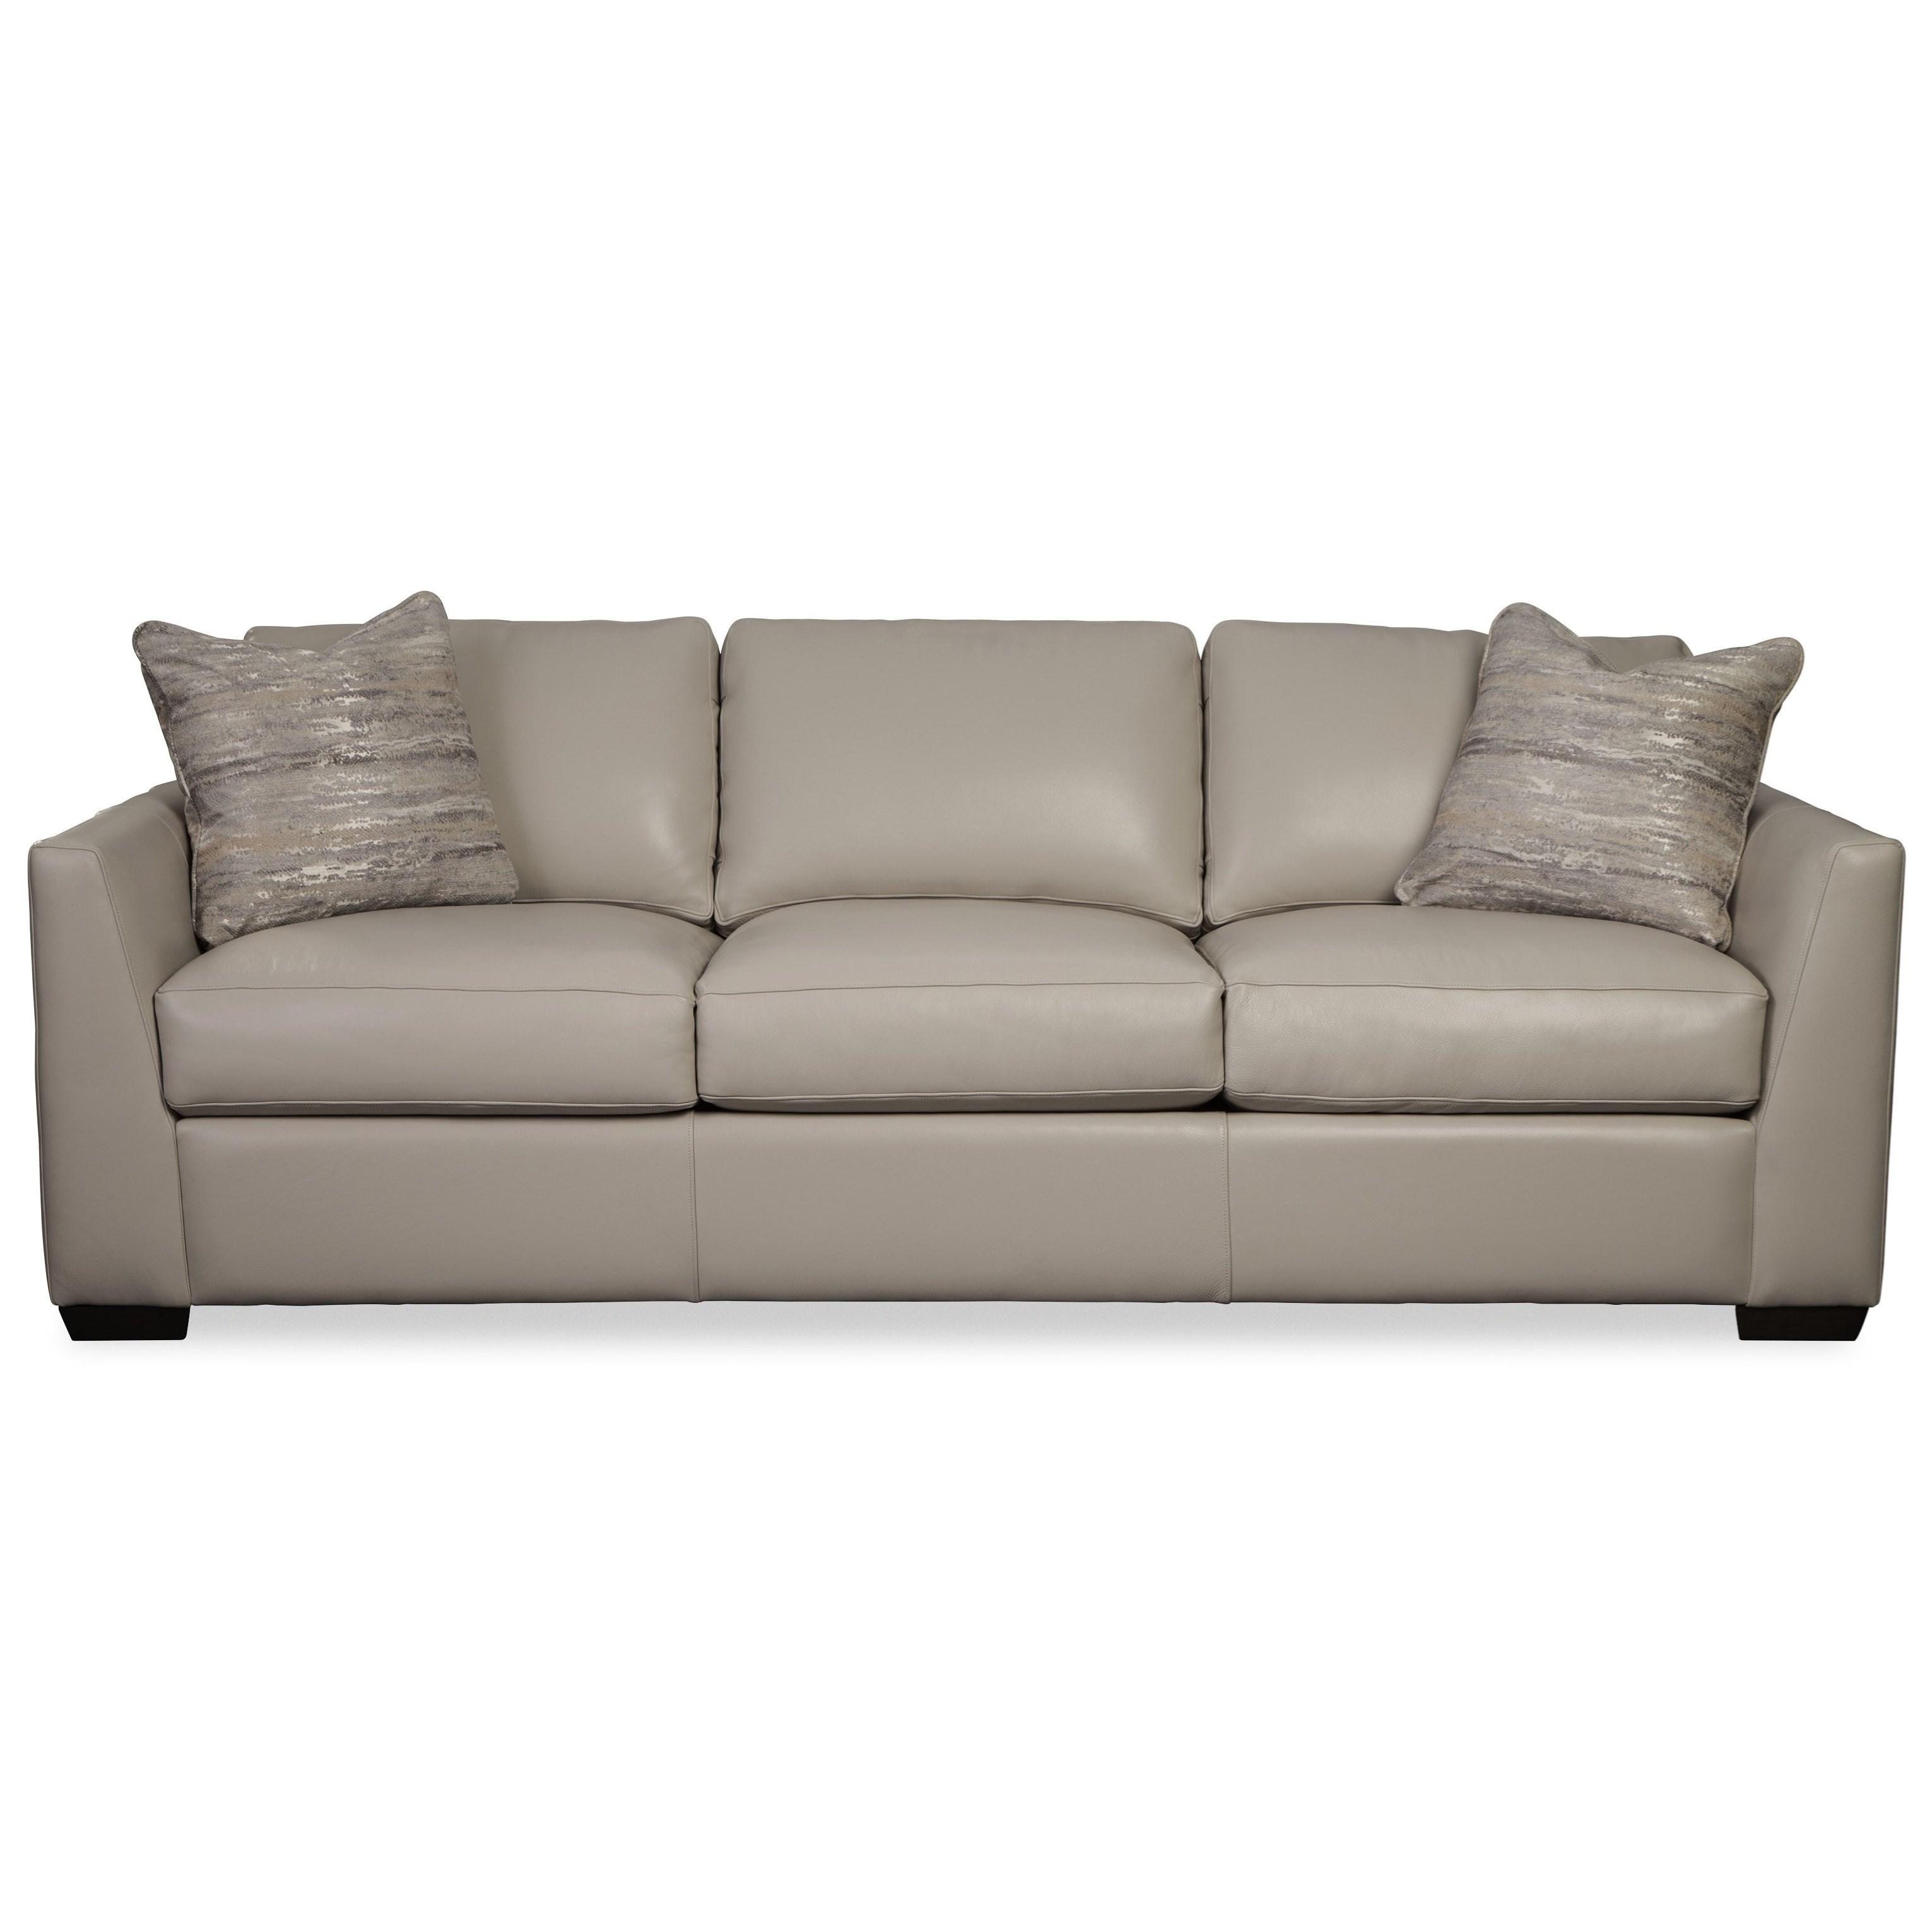 "L783950 95"" Sofa w/ Pillows by Hickorycraft at Johnny Janosik"